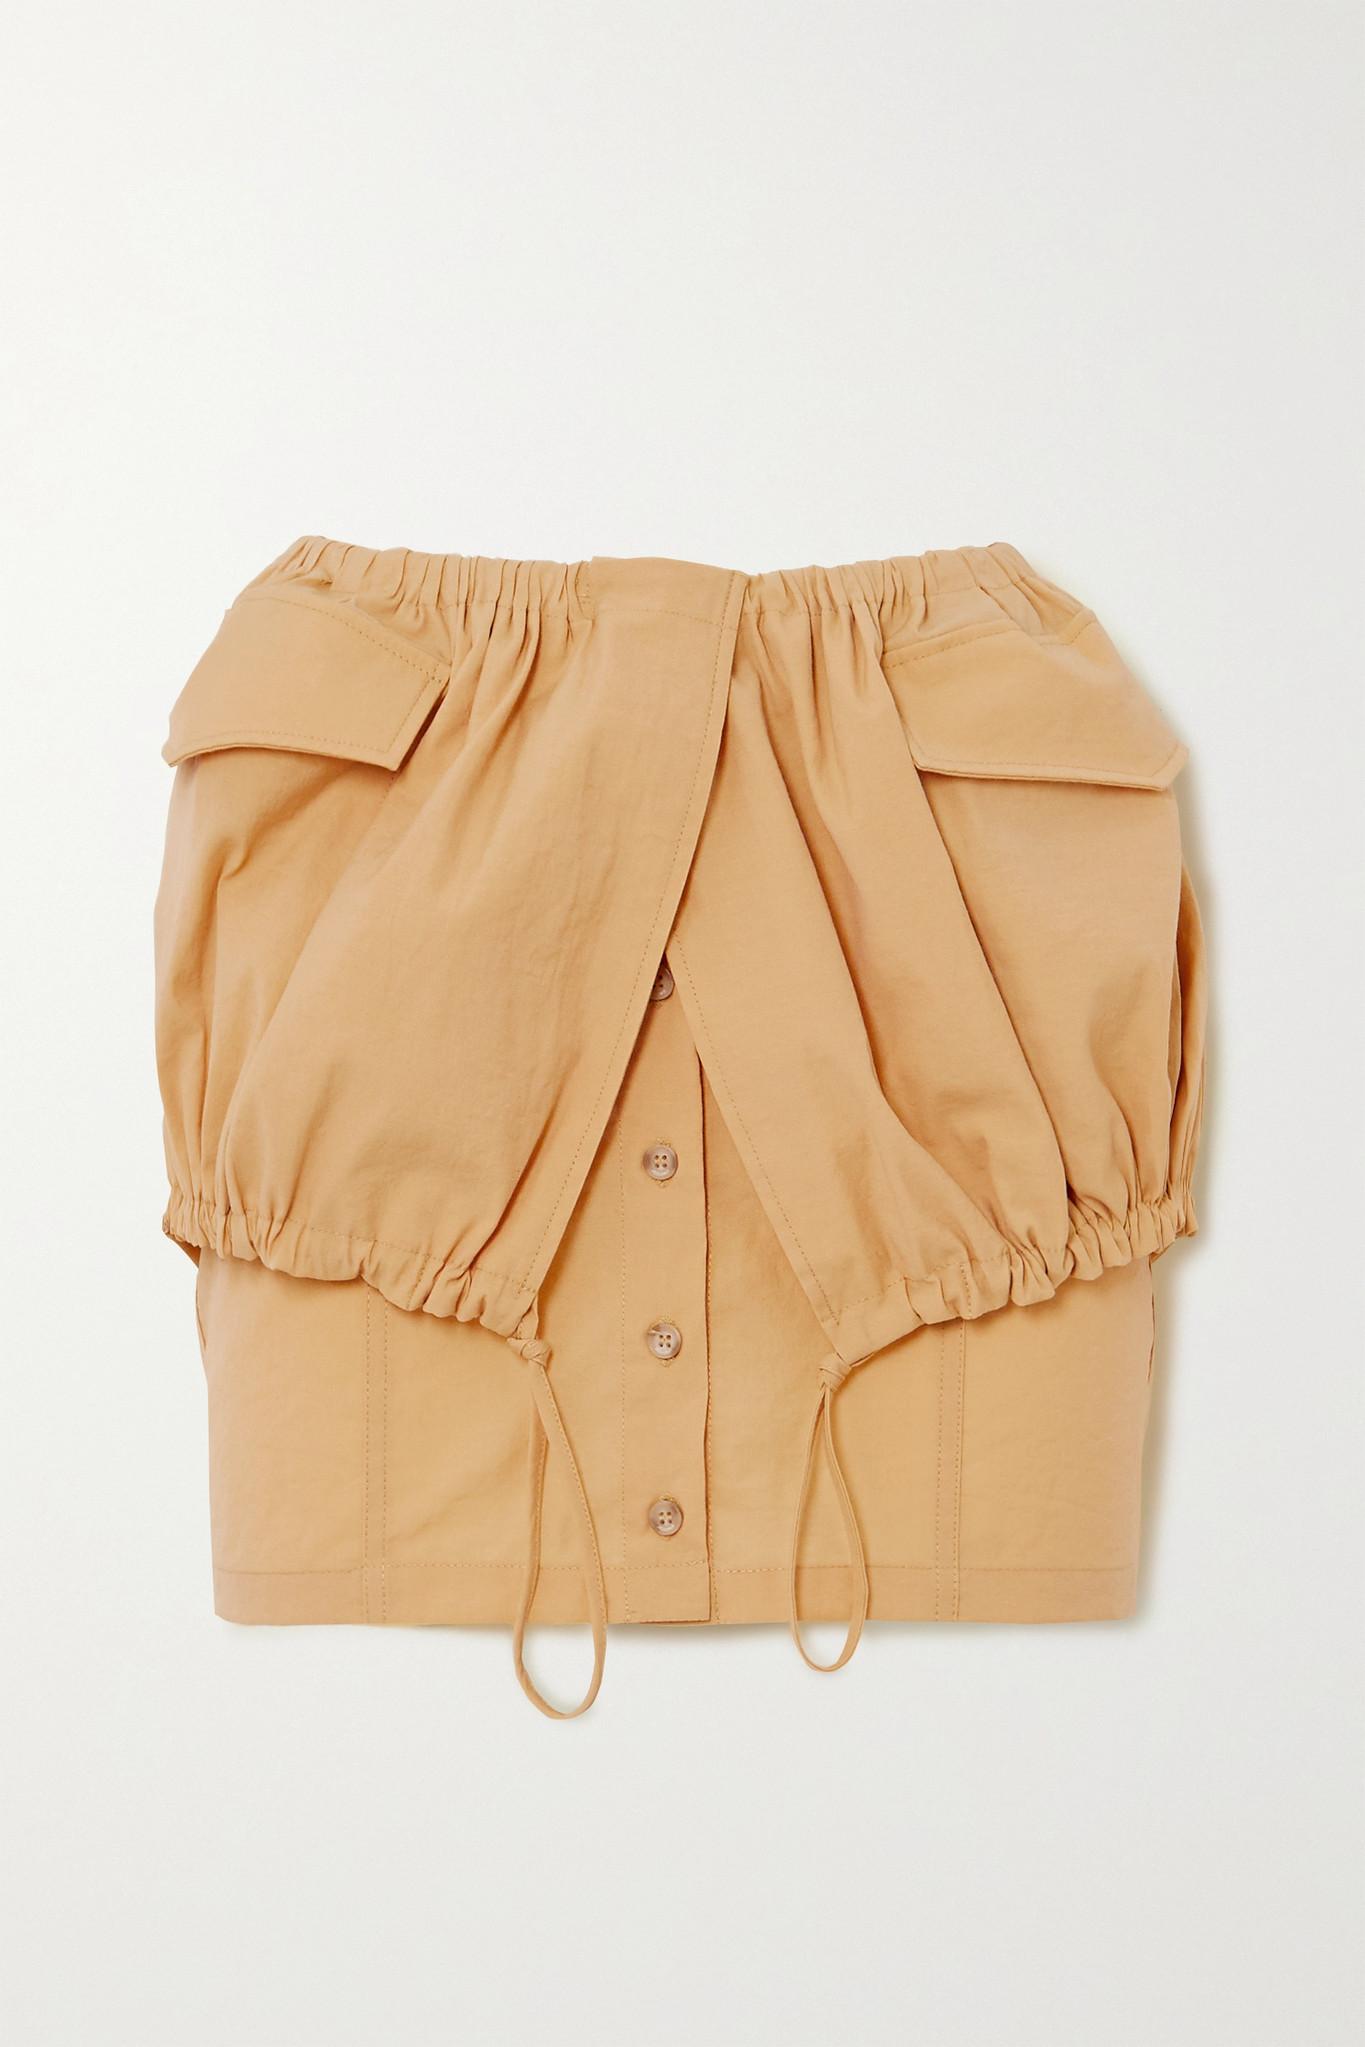 Cueillette Courte layered gathered poplin mini skirt by JACQUEMUS, available on net-a-porter.com for $172.5 Kourtney Kardashian Skirt Exact Product